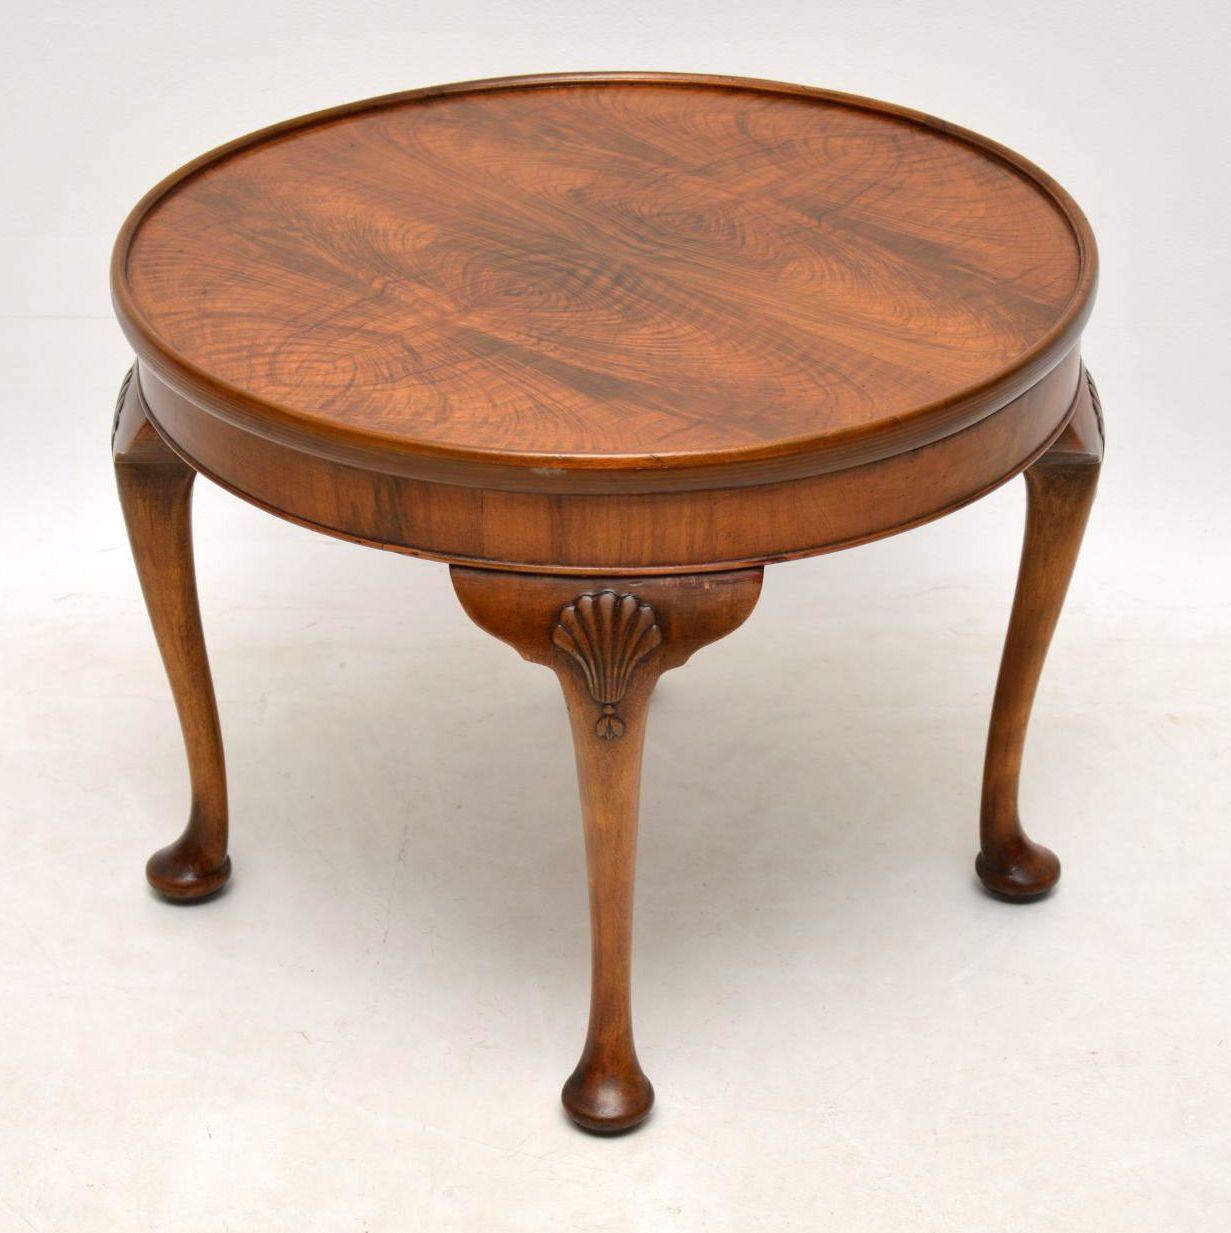 Antique Figured Walnut Coffee Table Marylebone Antiques Sellers regarding sizing 1231 X 1233